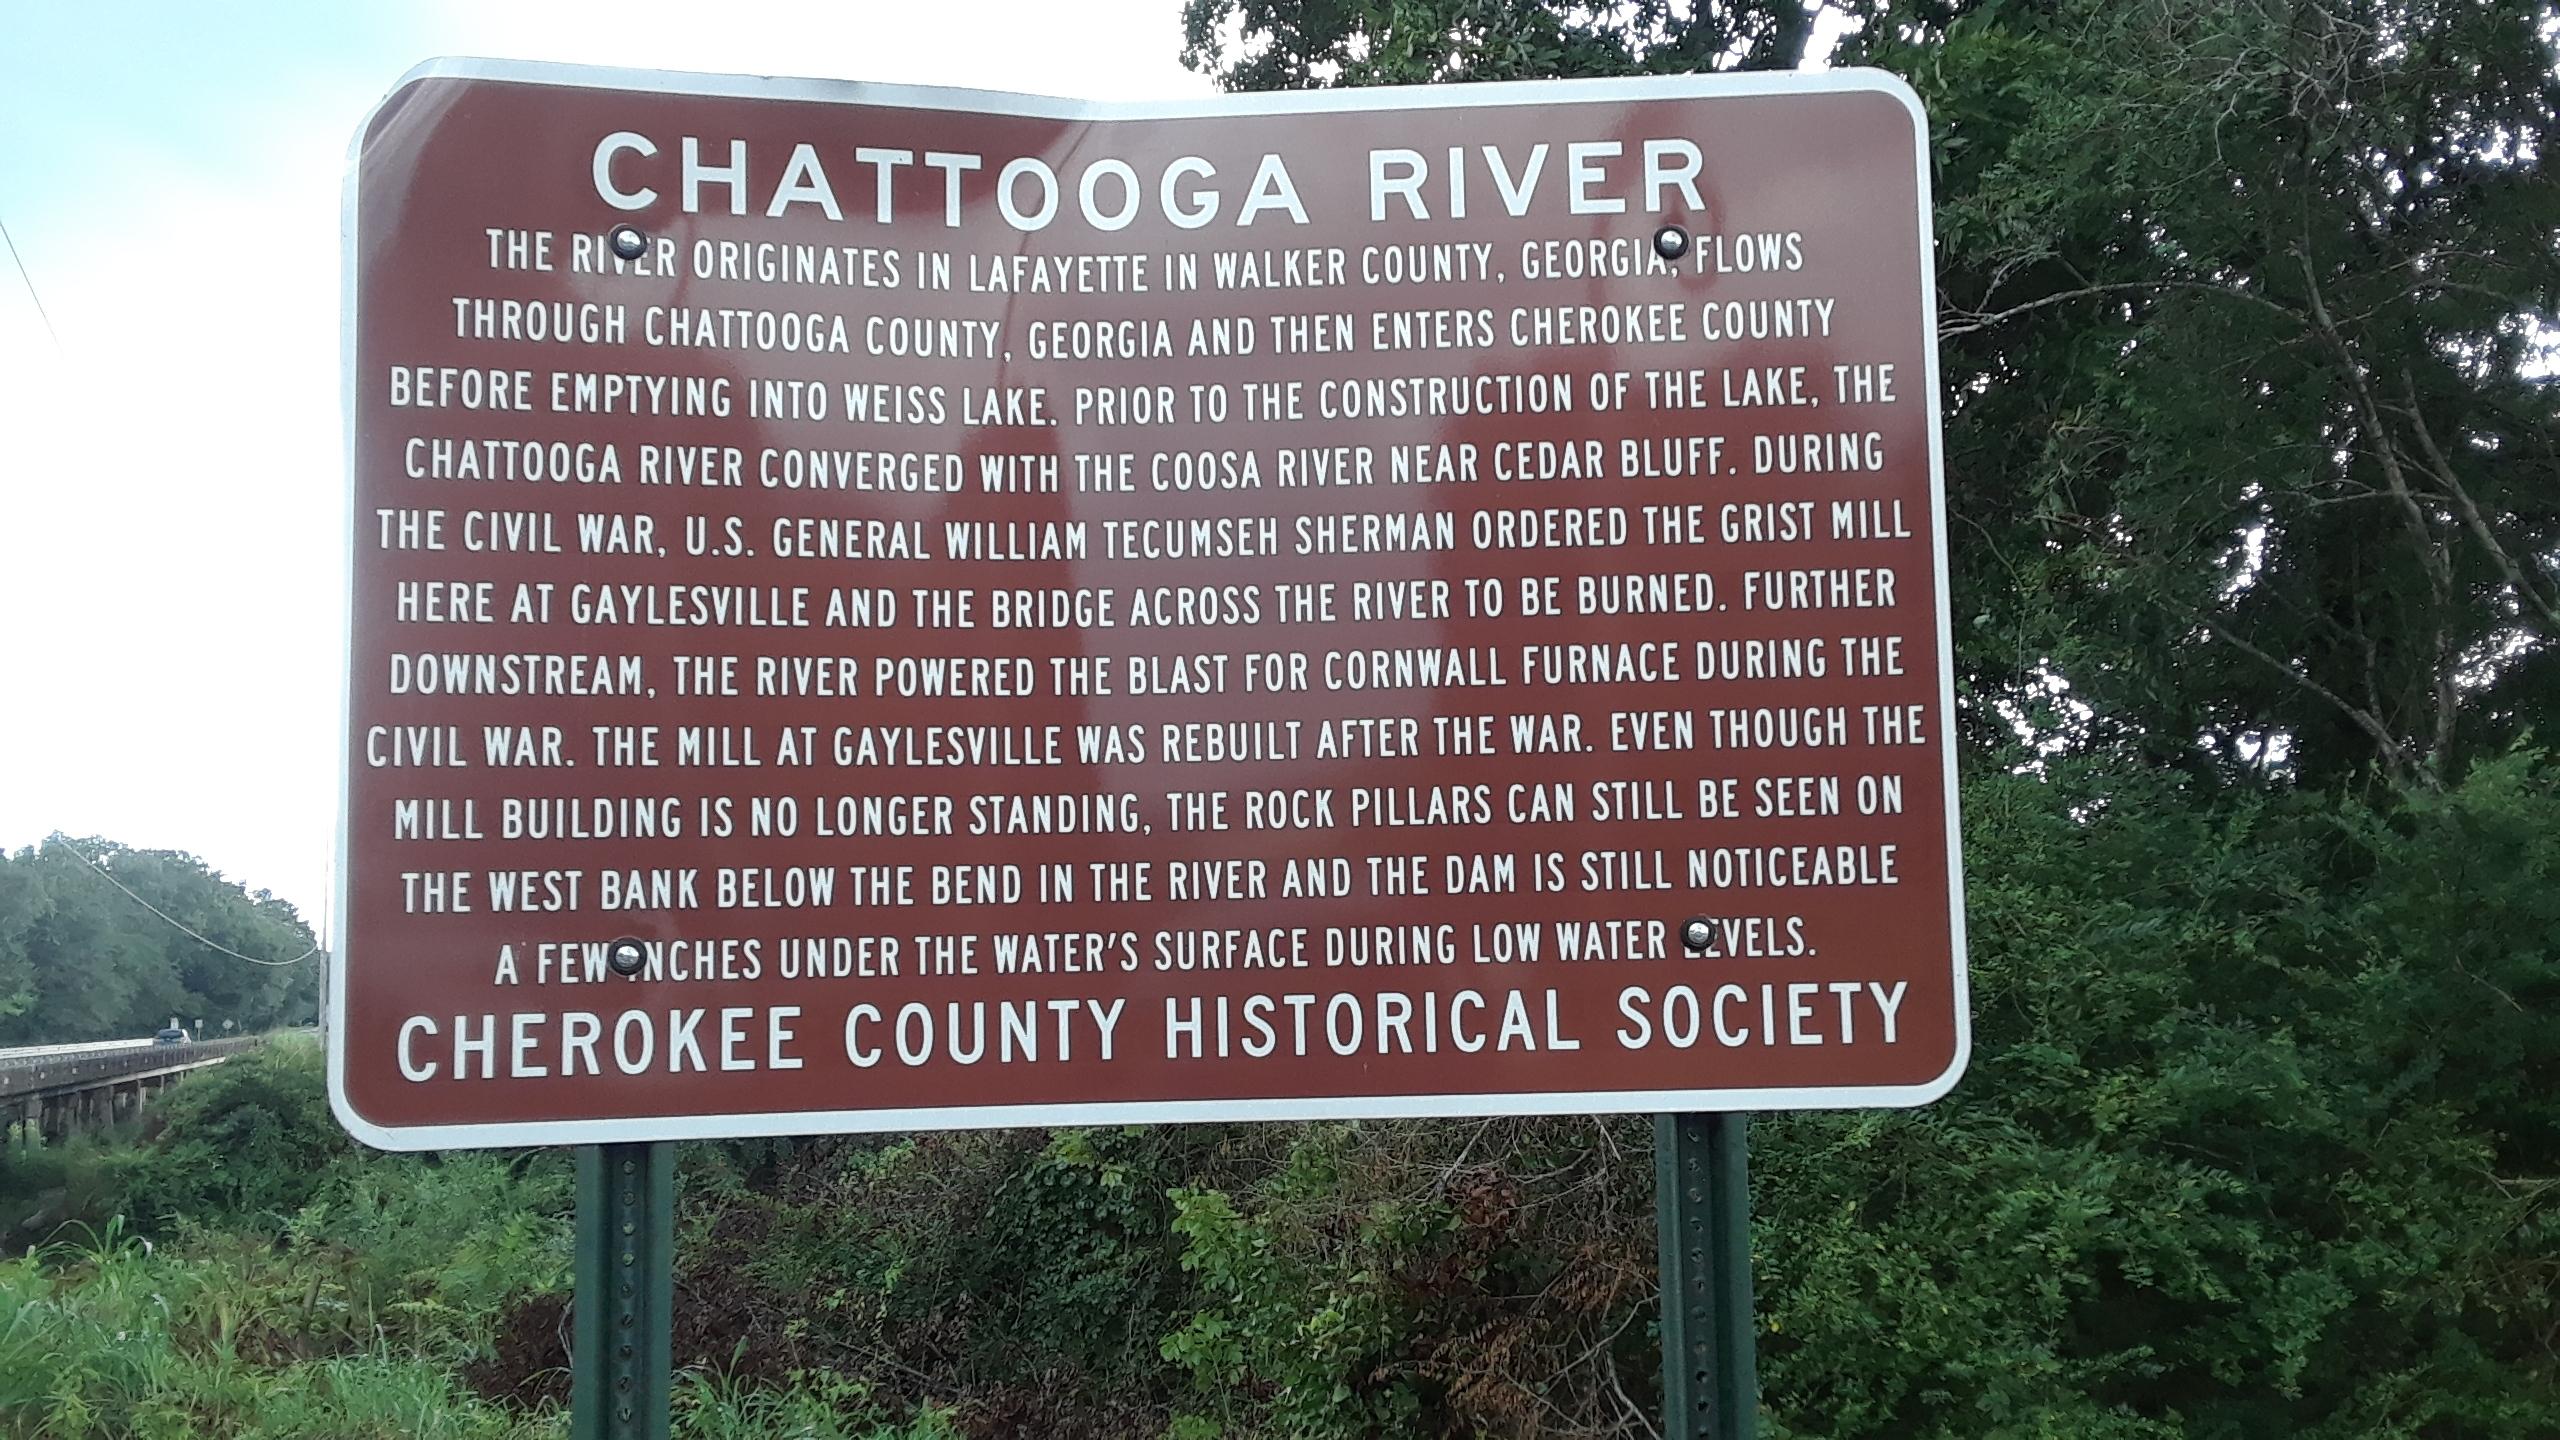 Chattooga River Marker